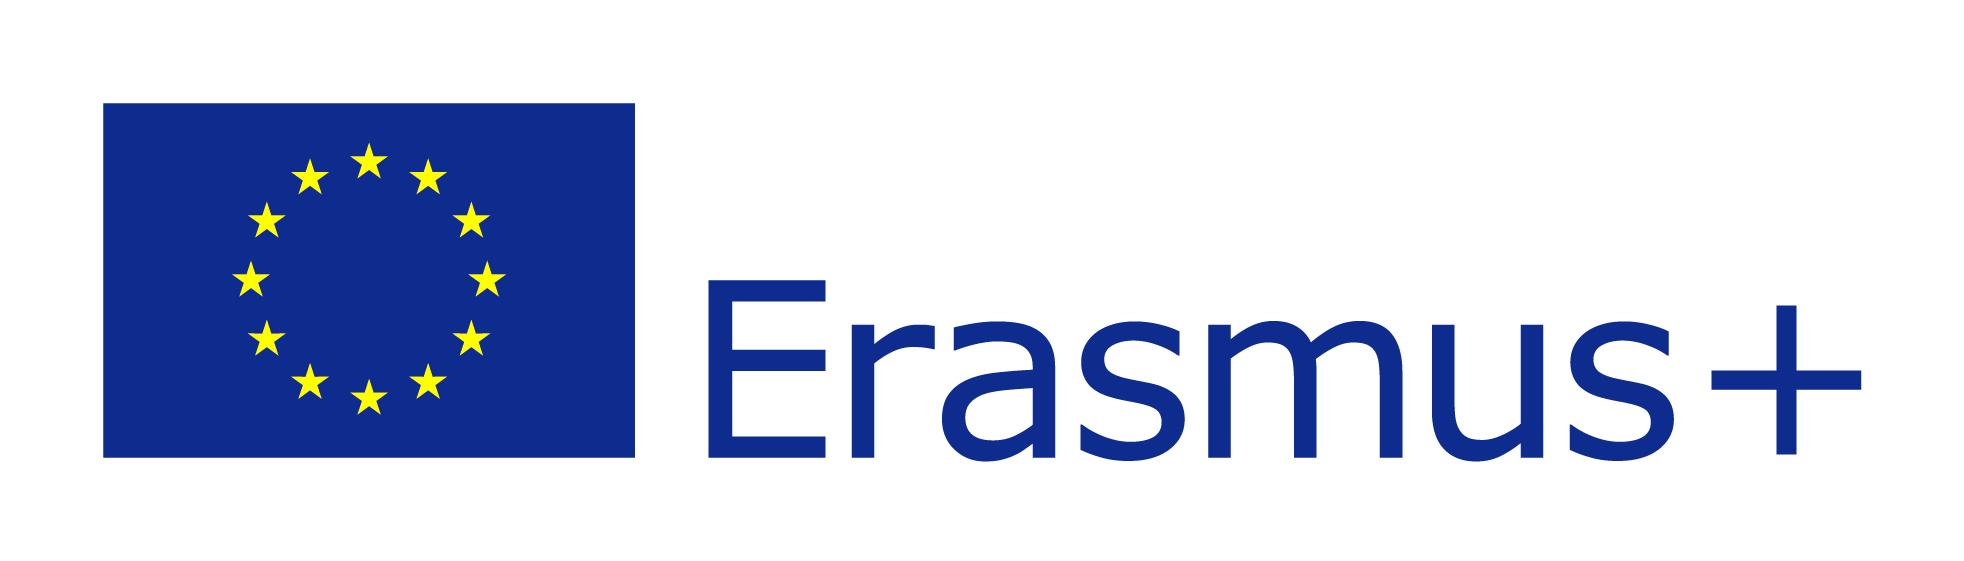 EU flag-Erasmus+_vect_POS.jpg